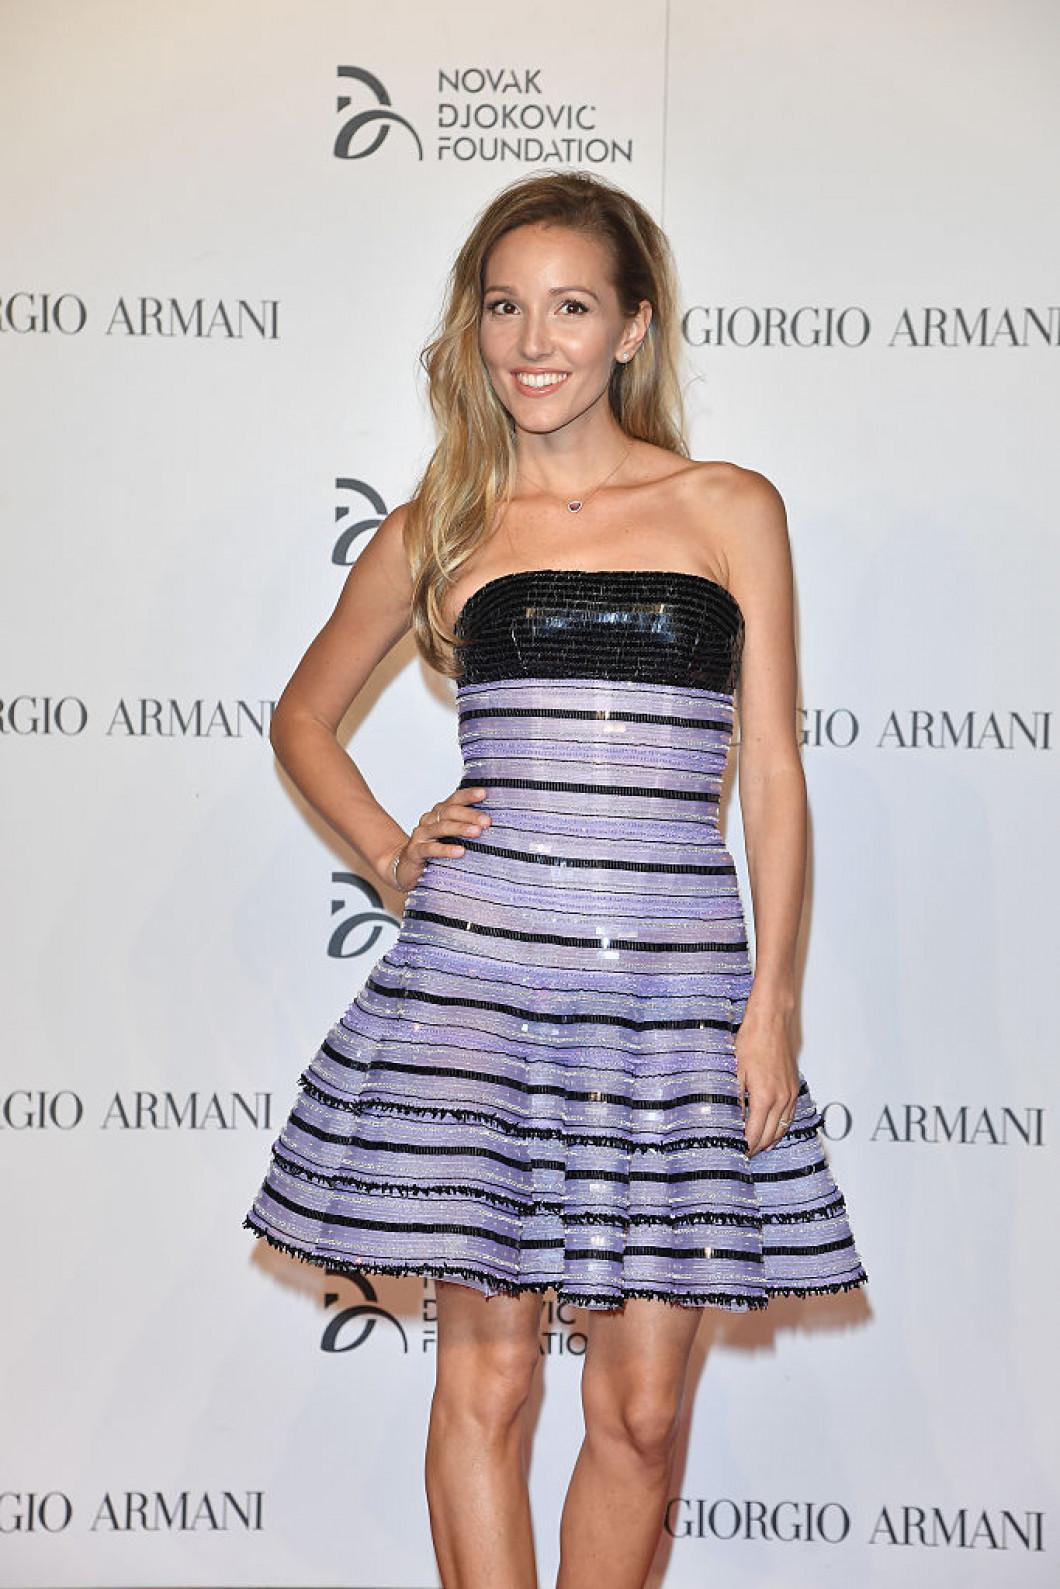 Tennis Meets Fashion At The Milano Gala Dinner Benefitting The Novak Djokovic Foundation Presented By Giorgio Armani